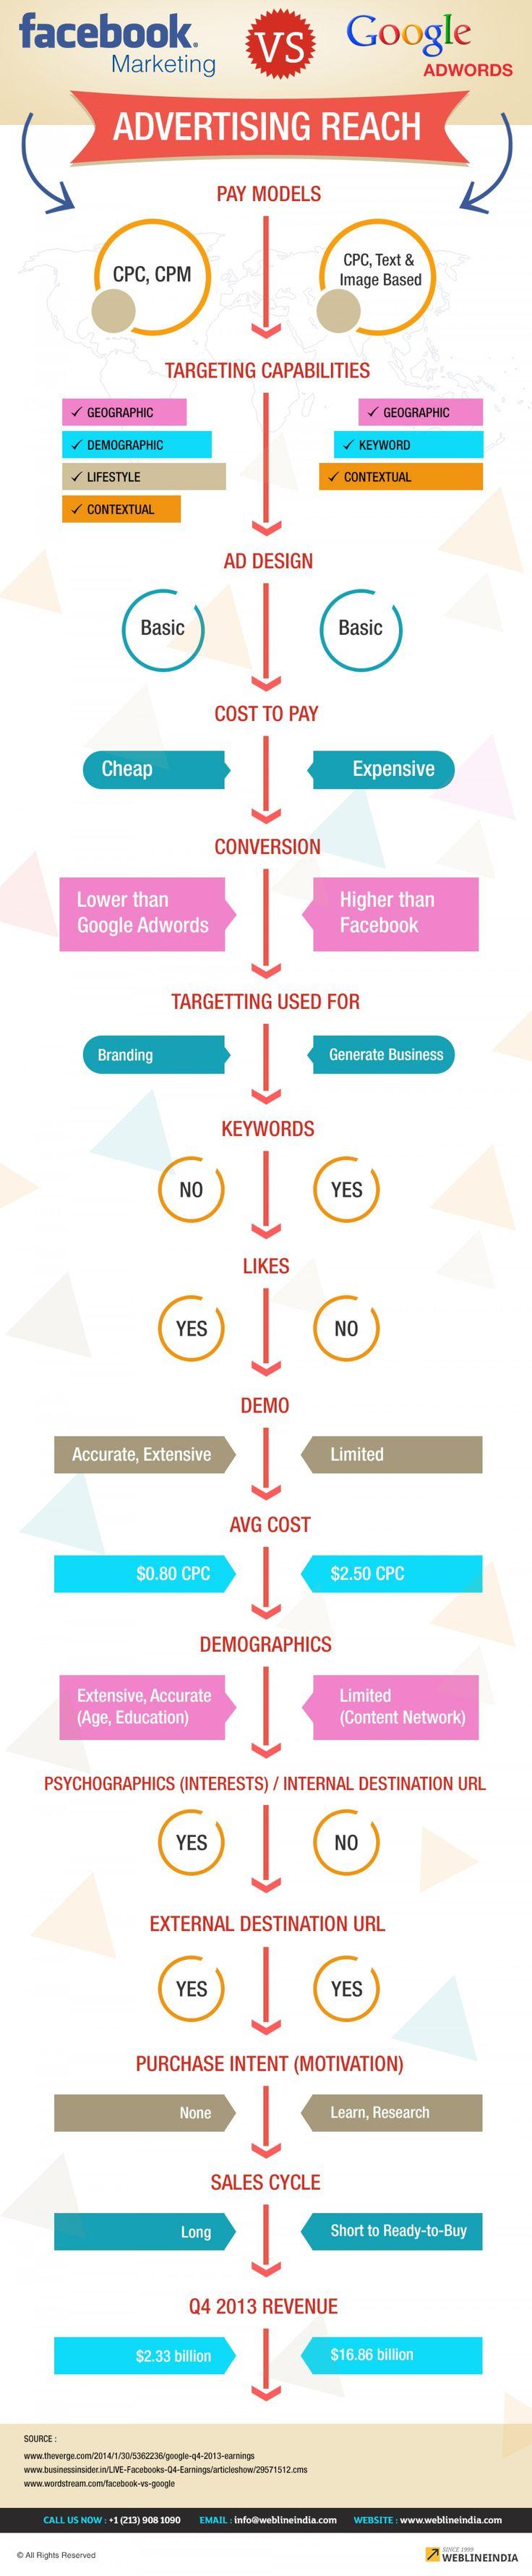 #FacebookMarketing vs #GoogleAdwords